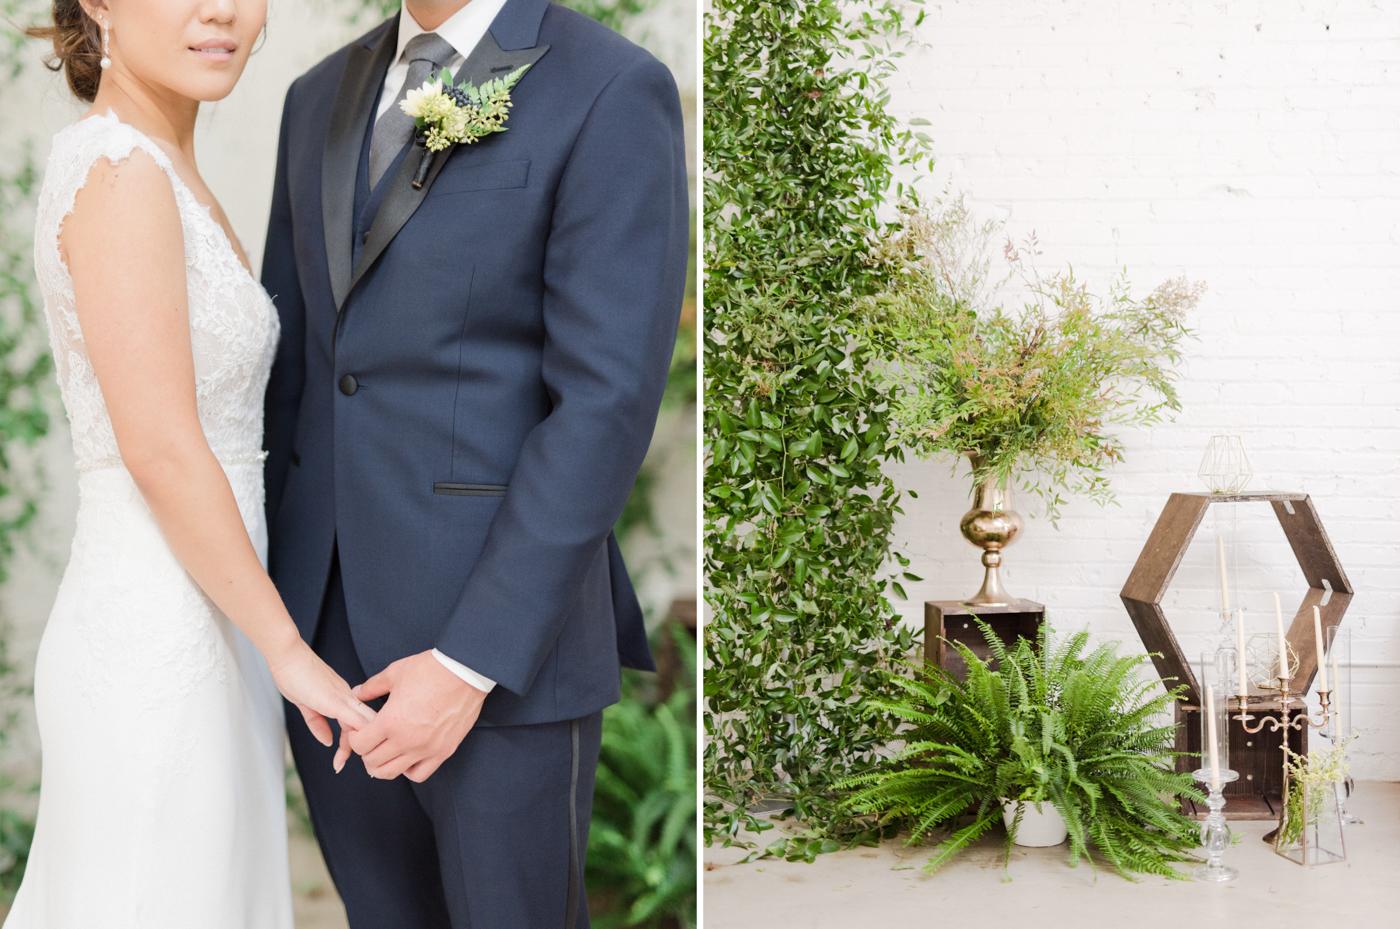 Modern_Wedding_HNYPT_Honeypot_LA_Photographer_Los_Angeles-24.jpg